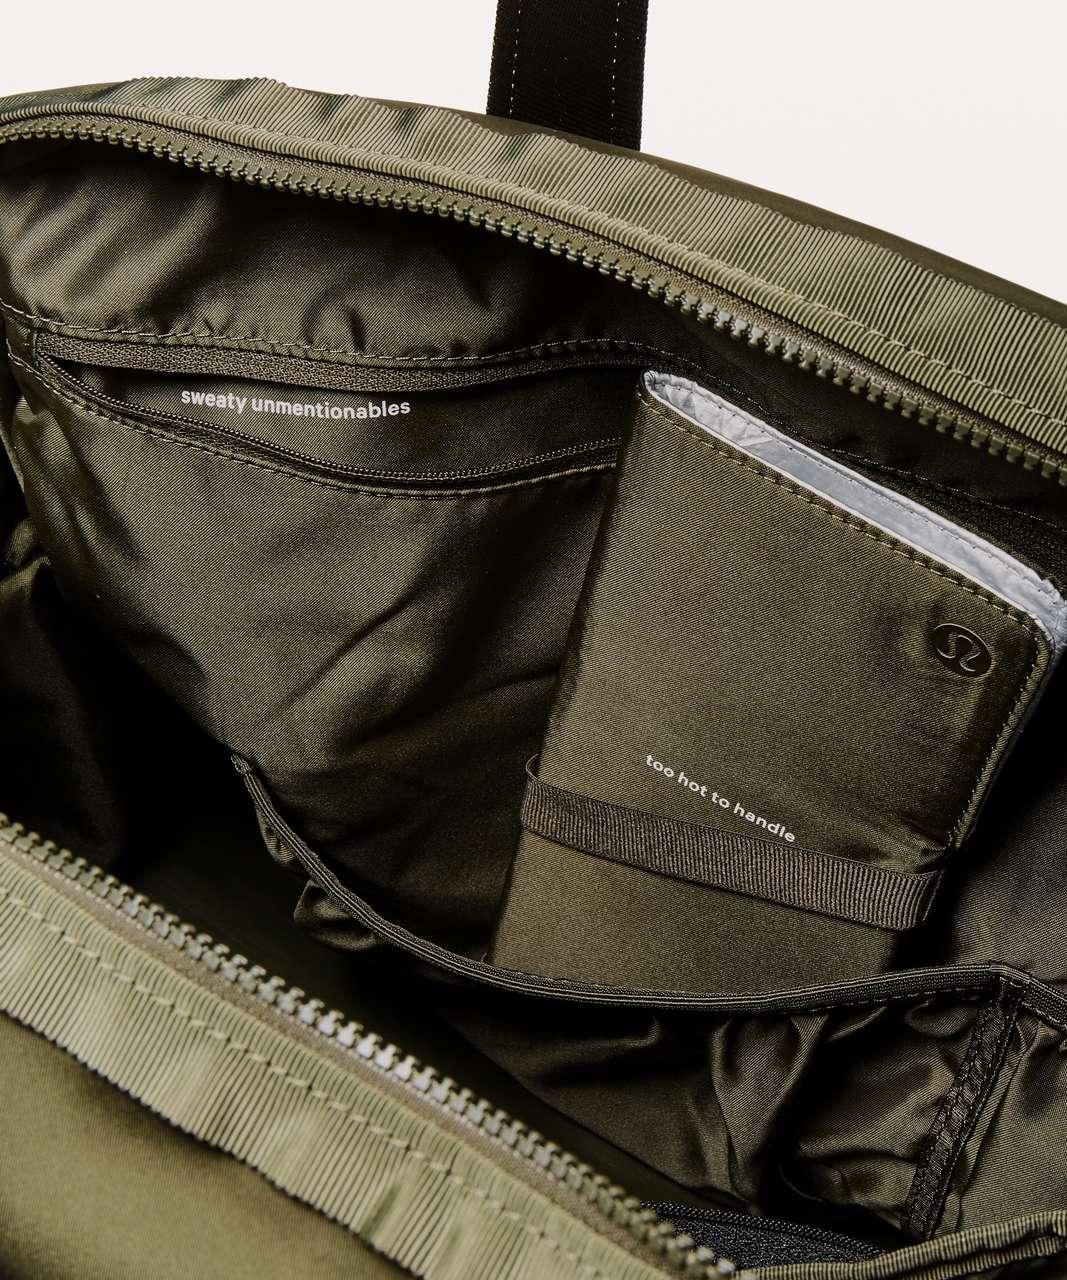 Lululemon All Day Duffel *Heatproof Pocket 31L - Dark Olive